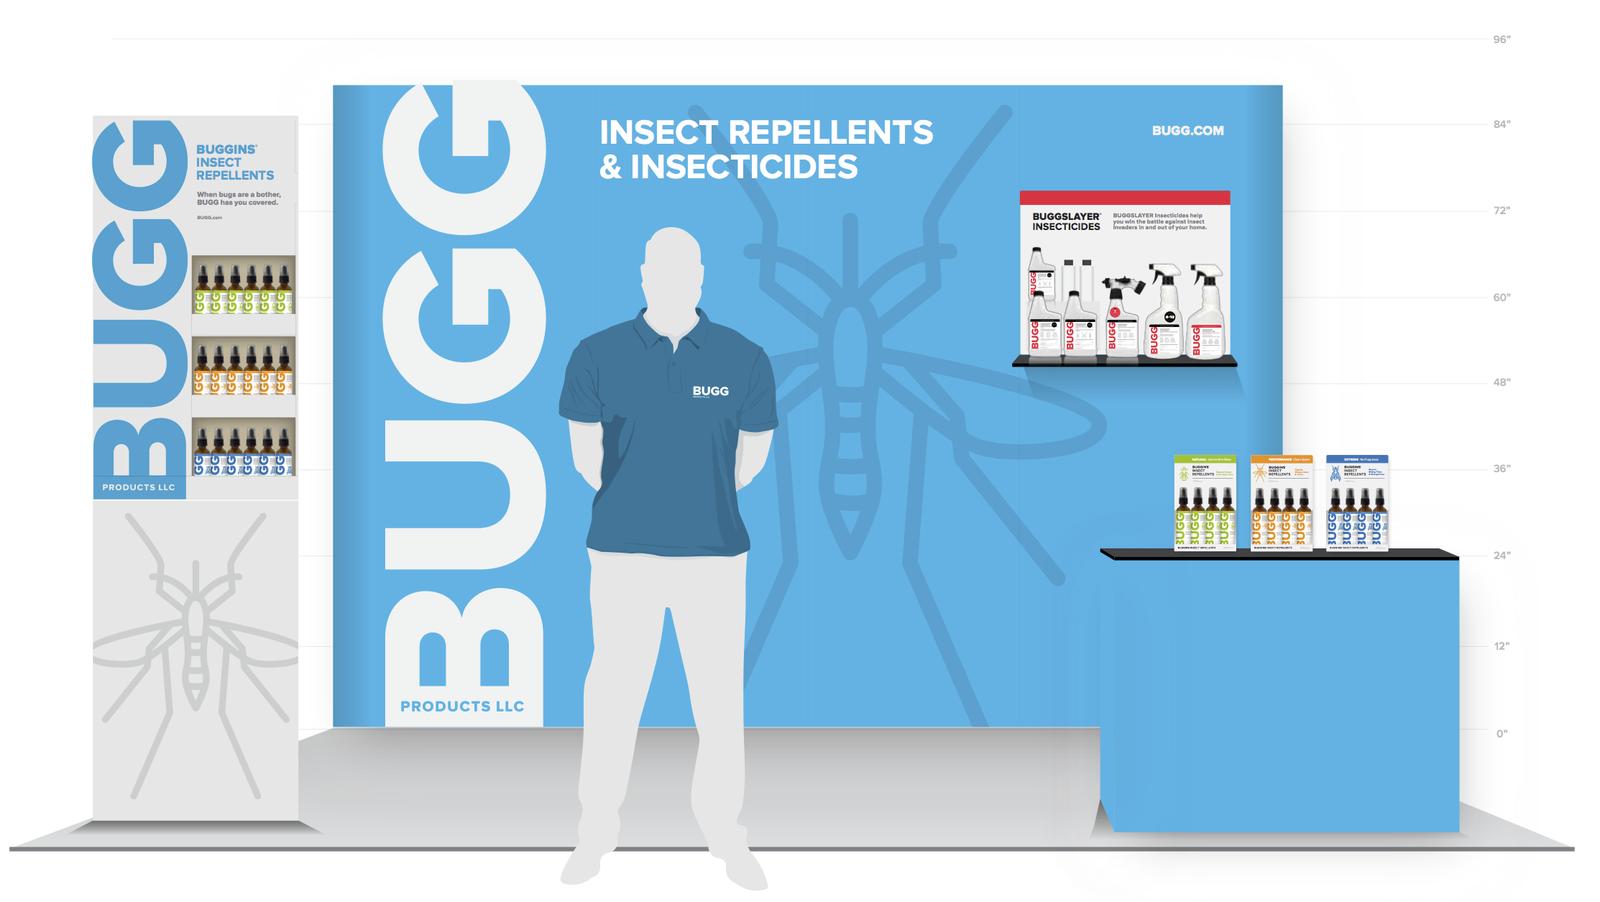 BUGG Products, LLC